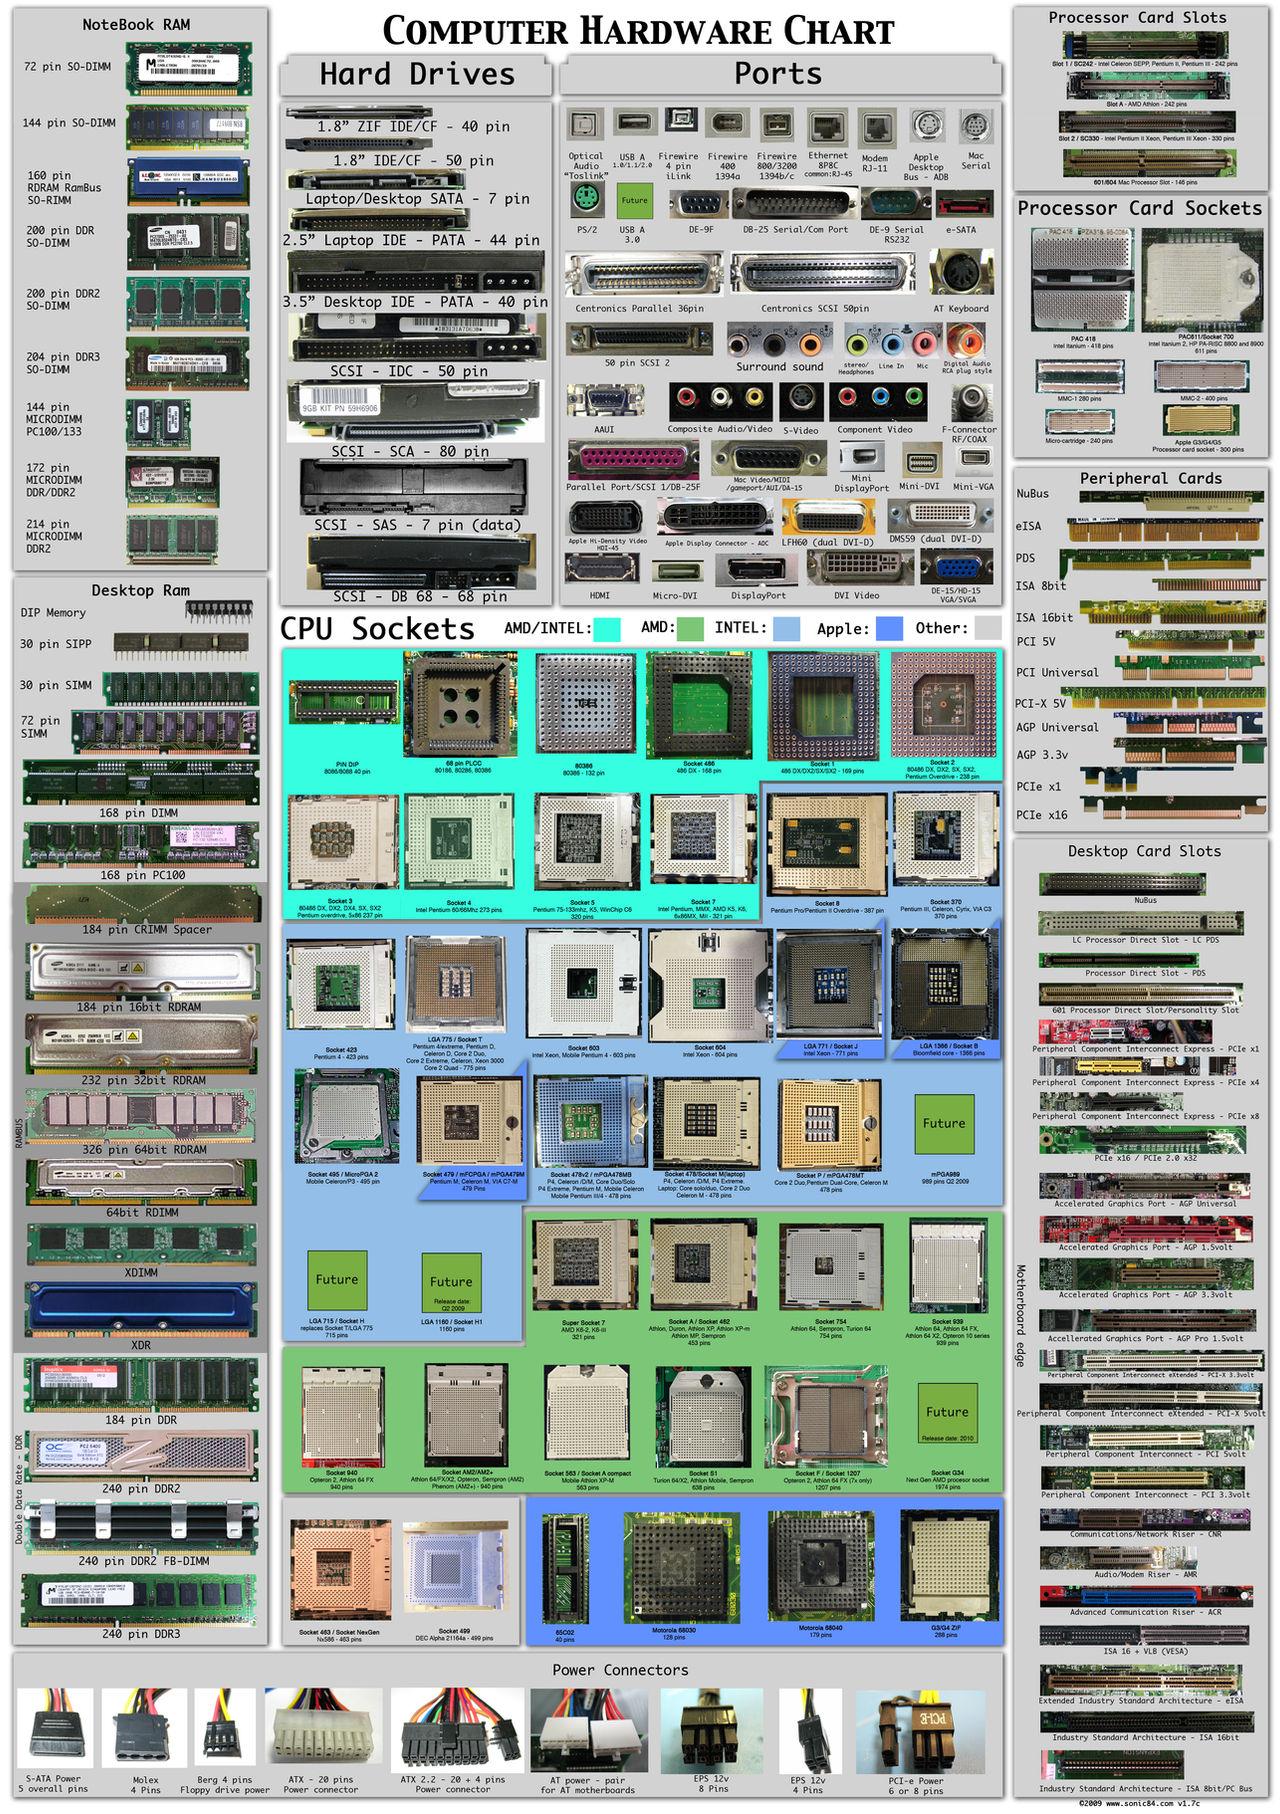 Computer hardware poster 1.7